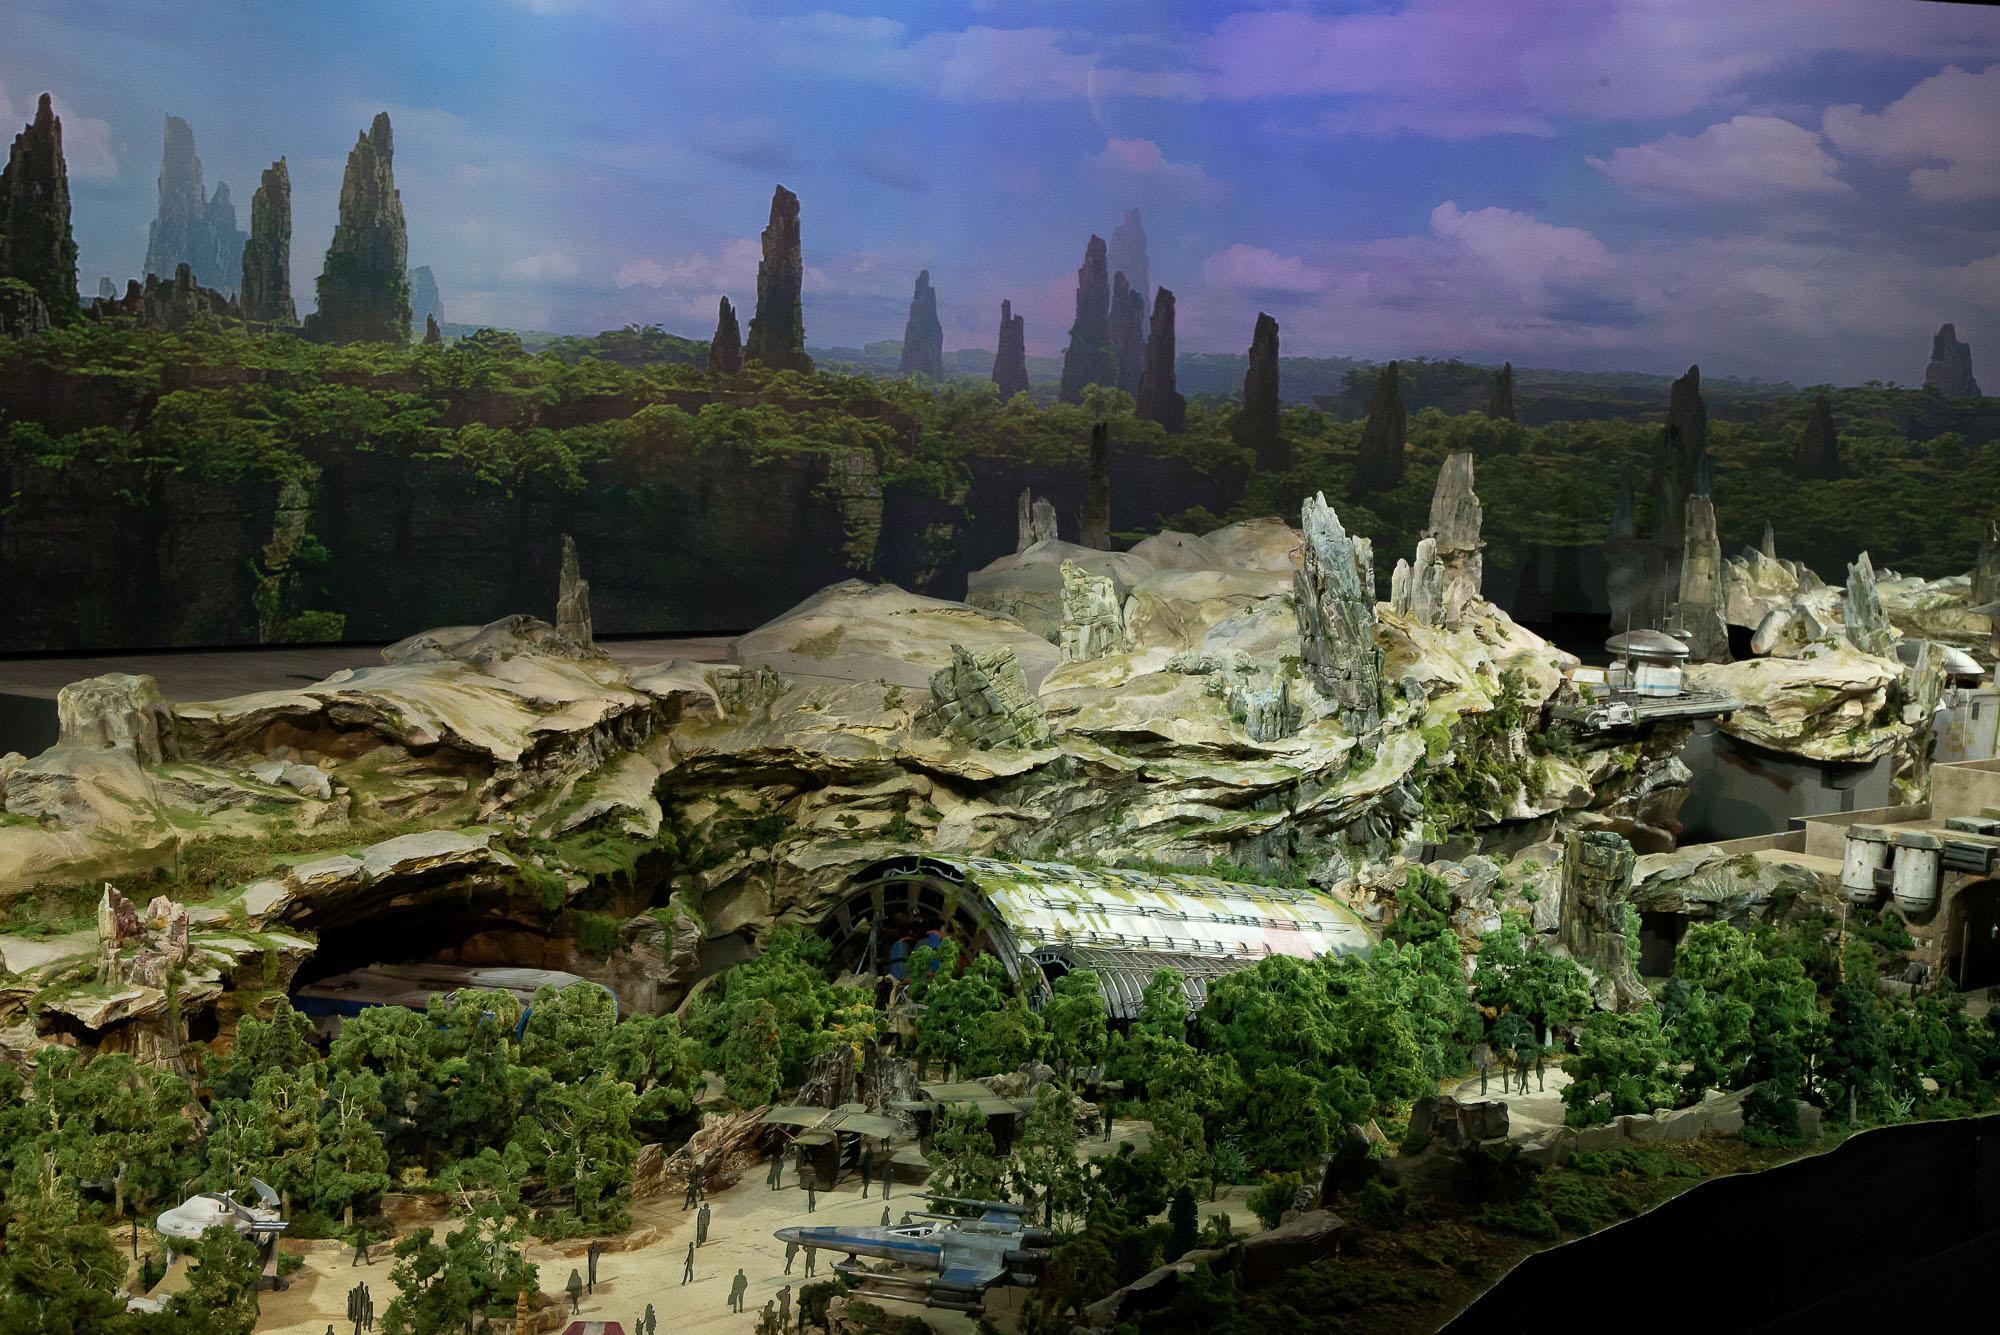 PHOTOS + VIDEO: Star Wars Land Model at D23 Expo - Blog Mickey